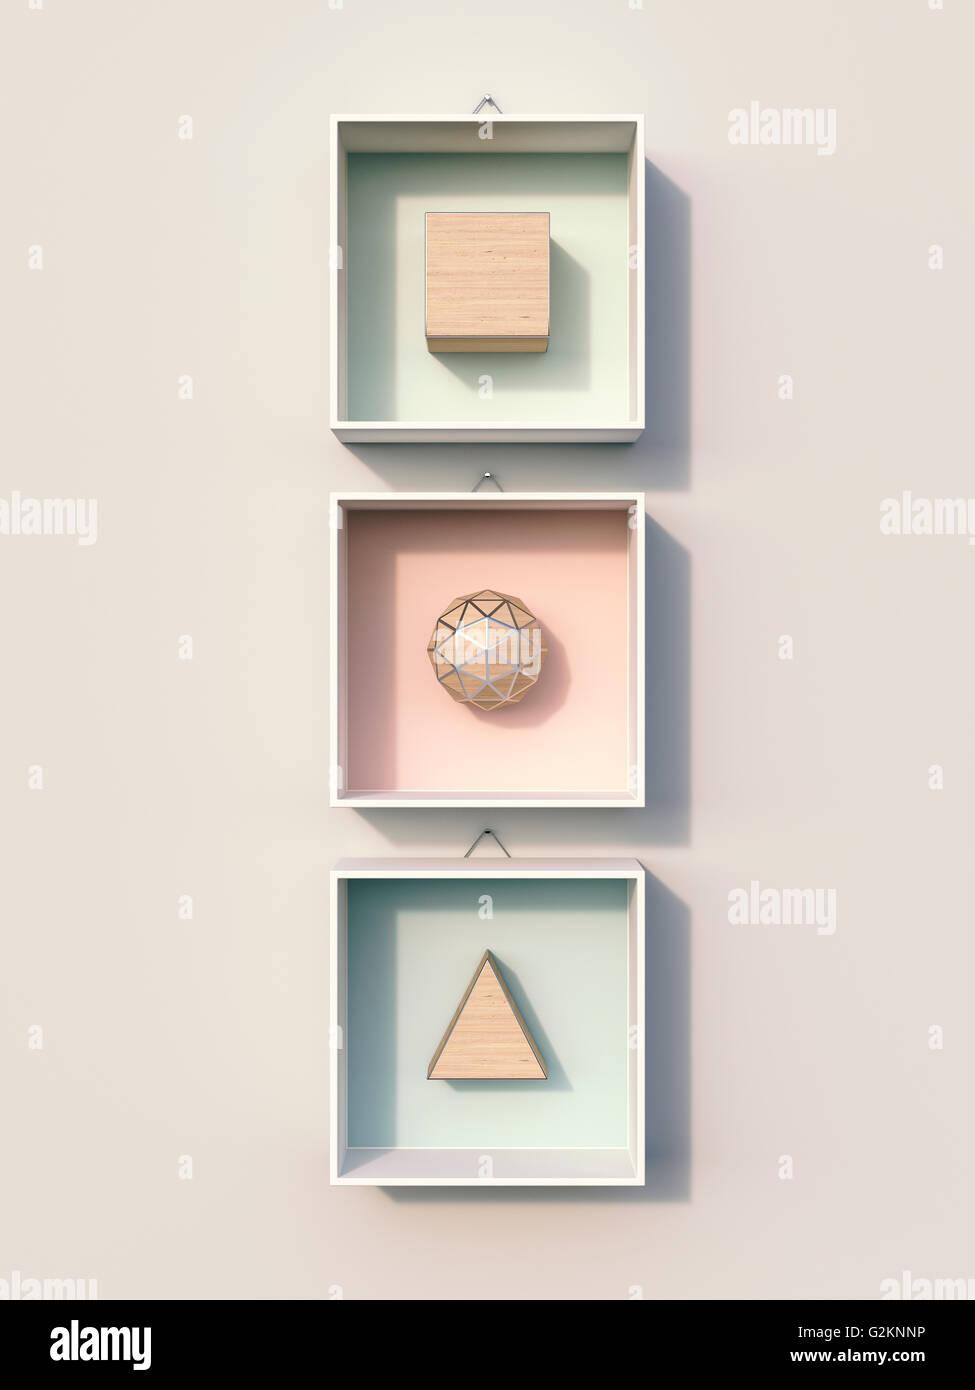 geometric stockfotos geometric bilder alamy. Black Bedroom Furniture Sets. Home Design Ideas